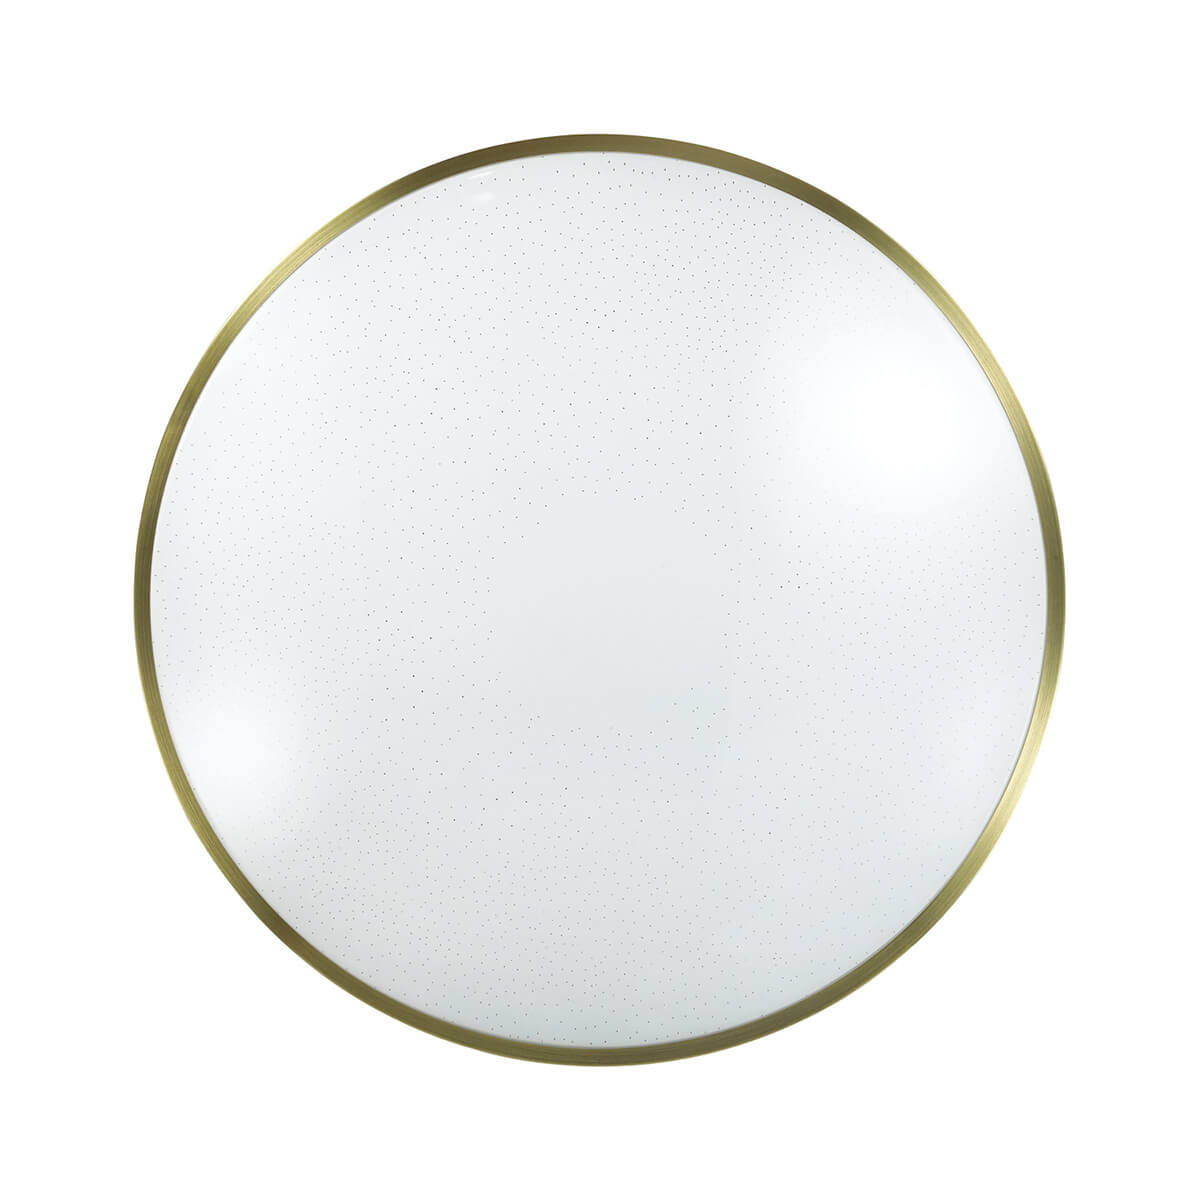 Светильник Sonex 2089/EL светильник sonex 2049 el